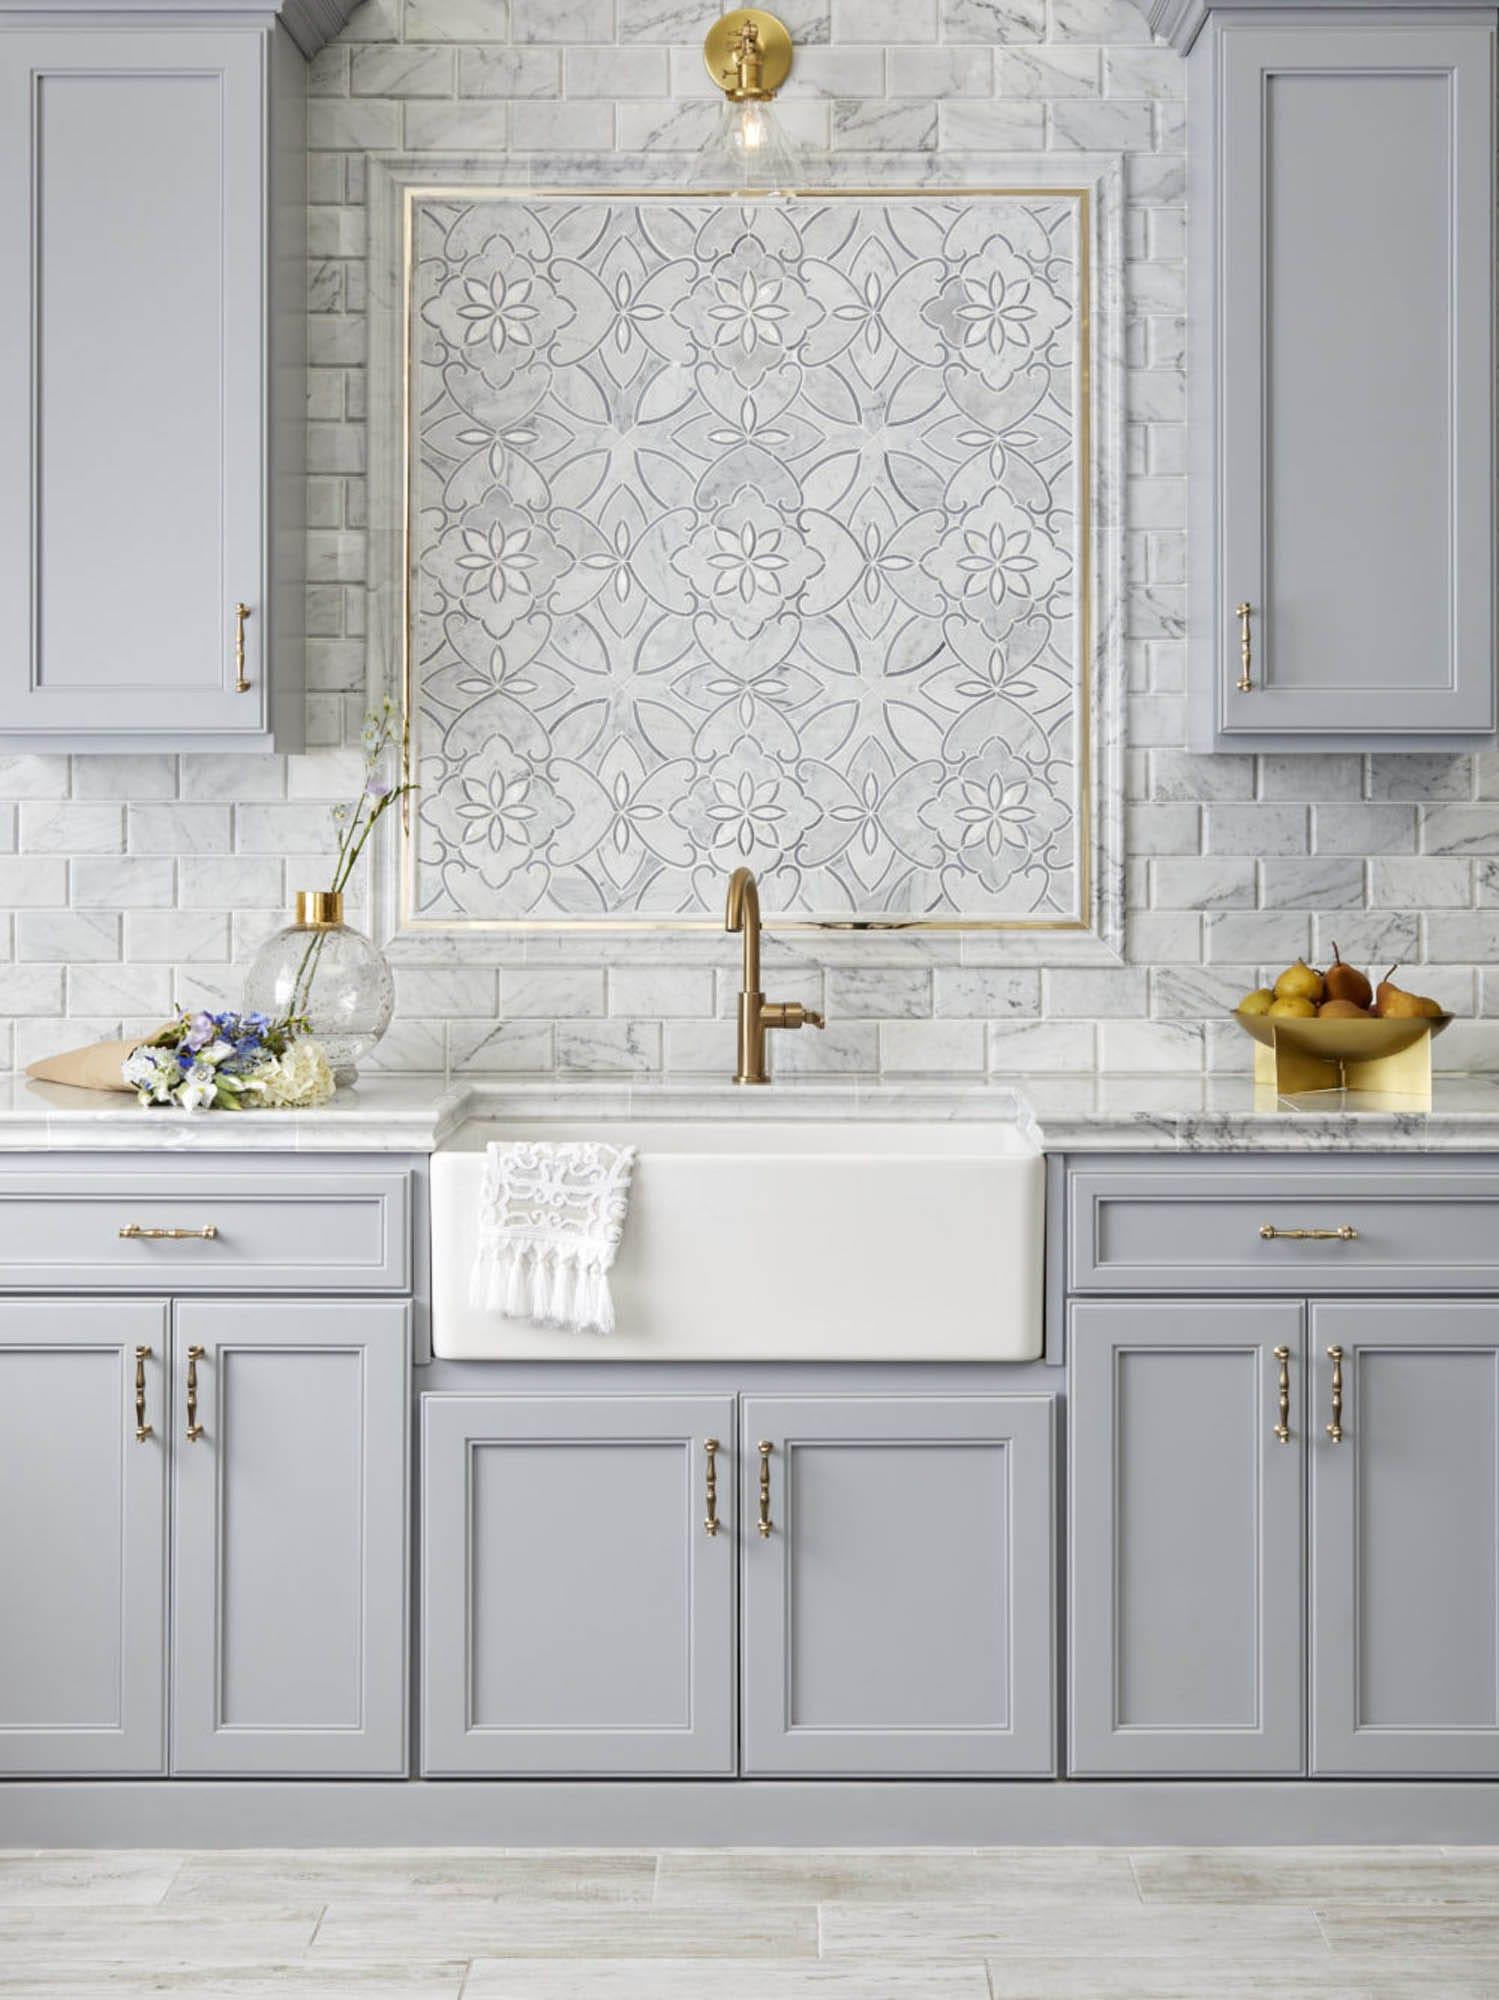 Distinct Designs With Waterjet Mosaics The Tile Shop Blog